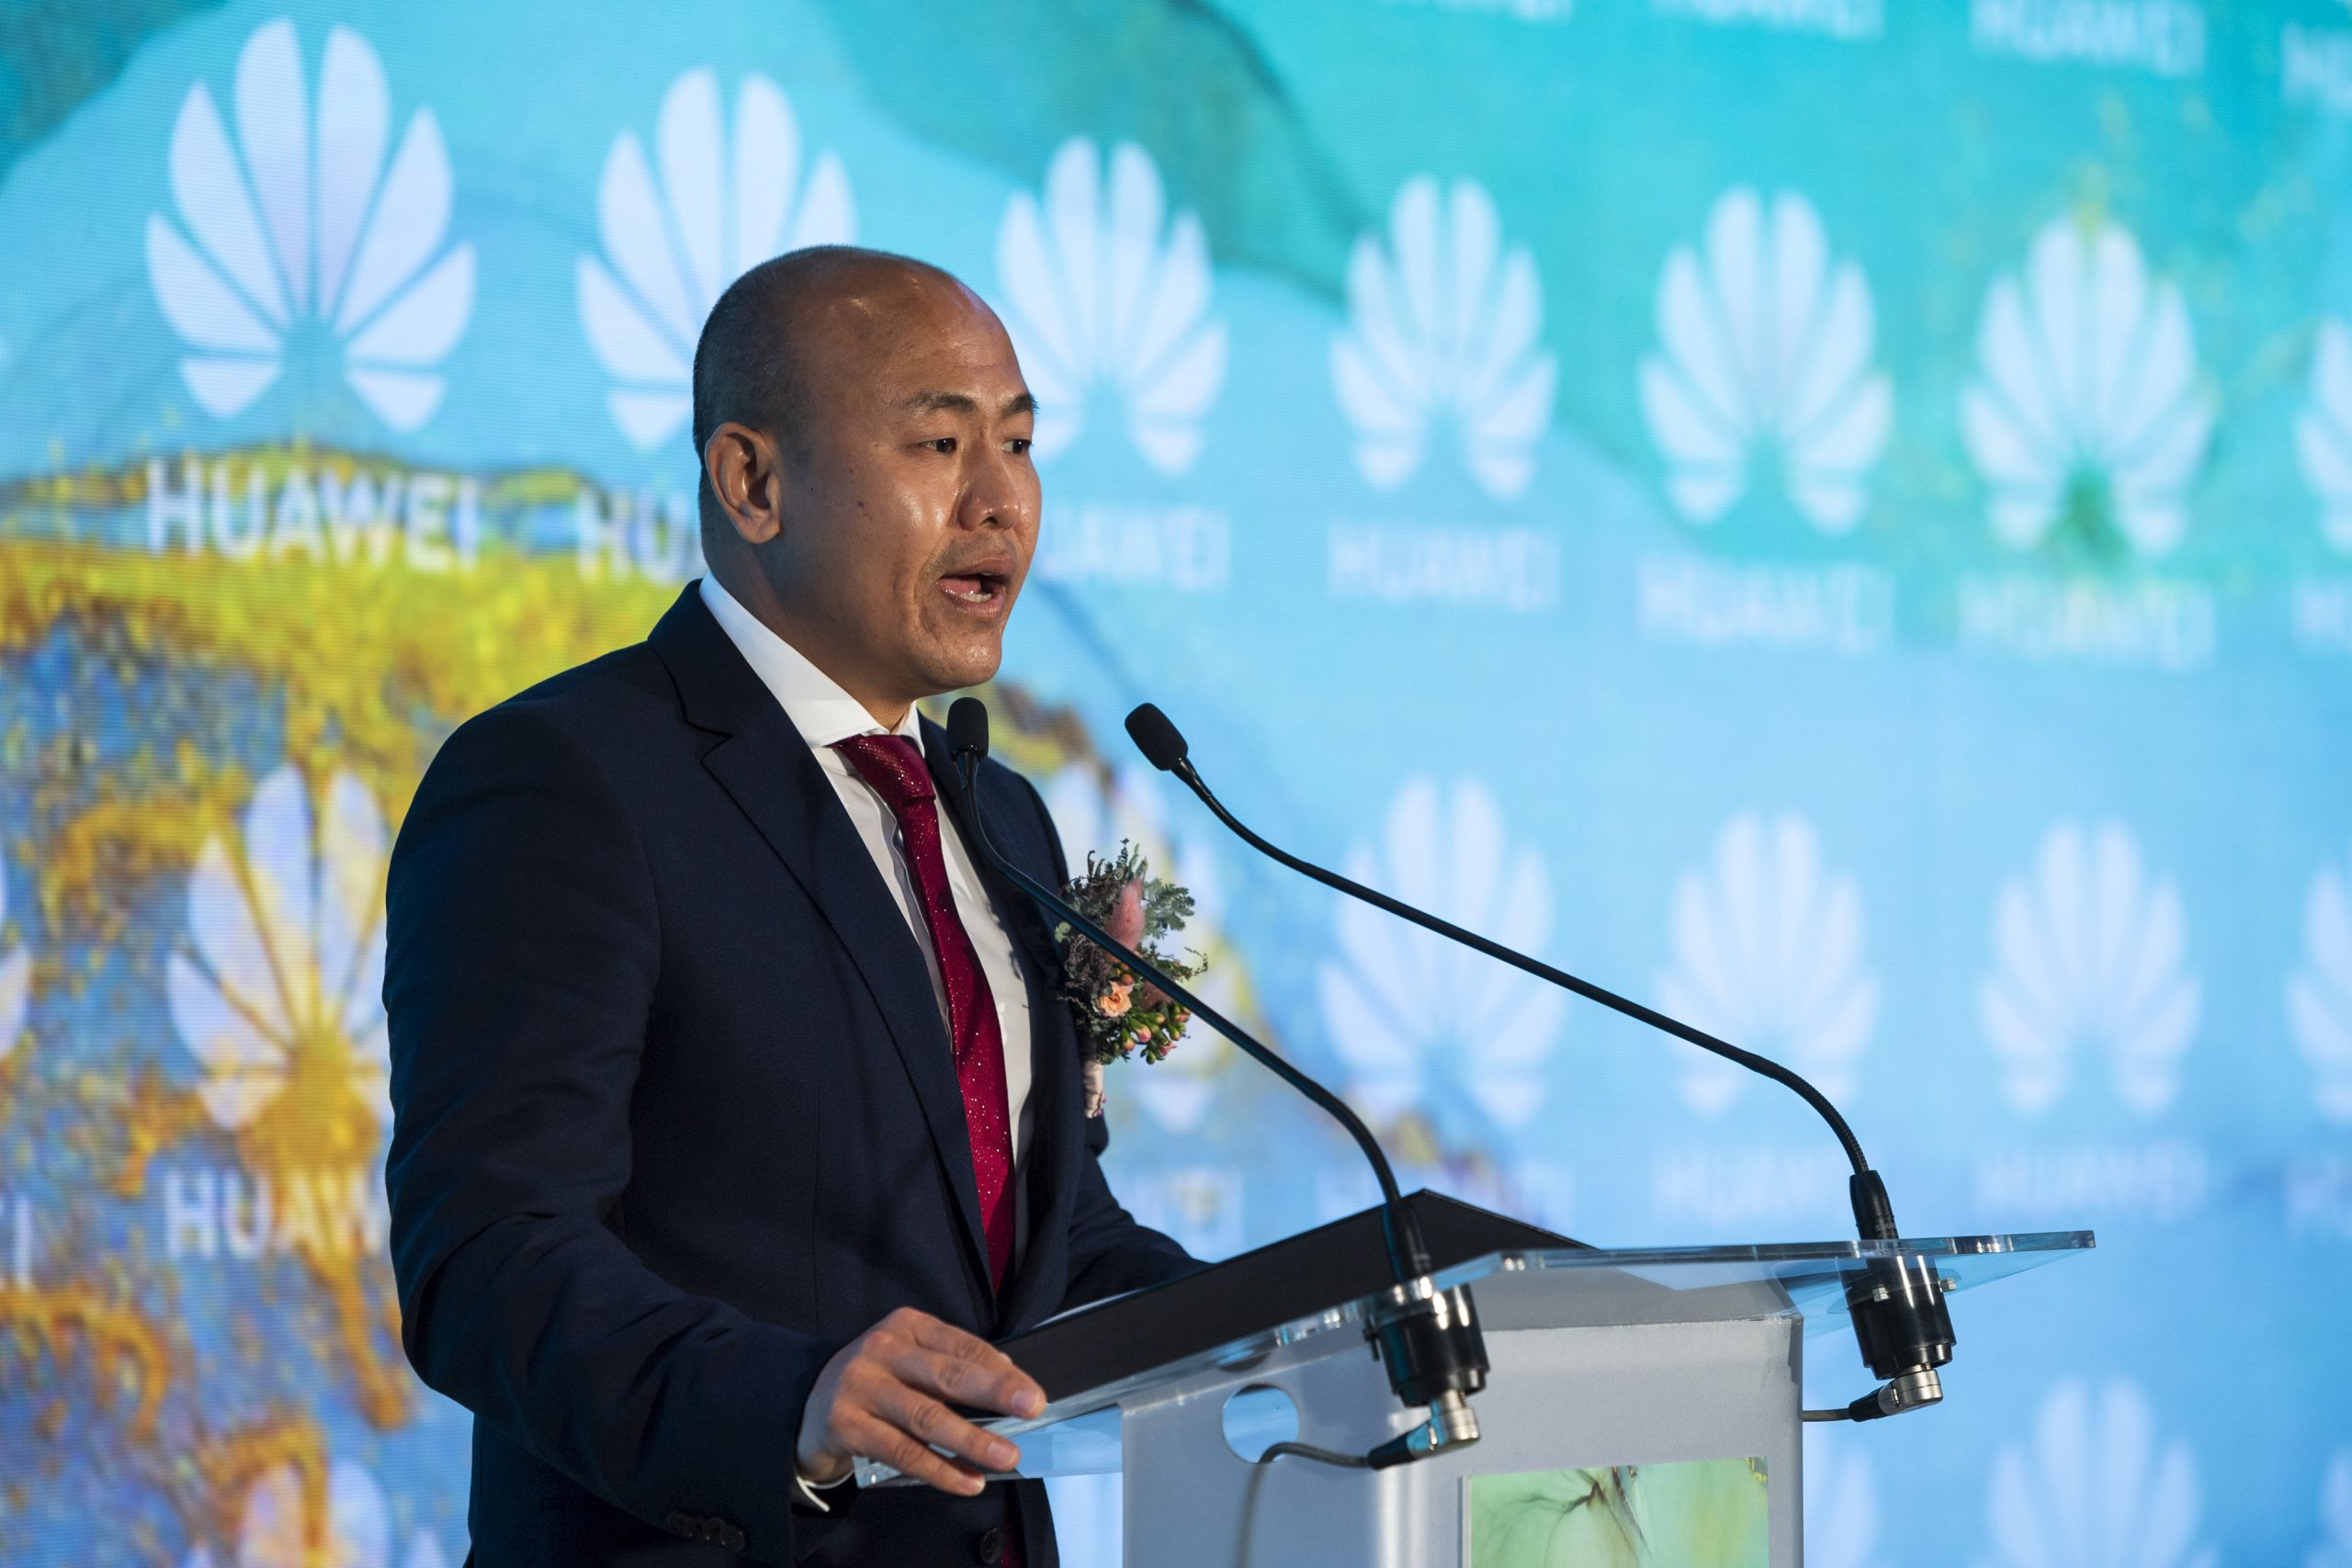 Huawei's Economic Influence in Hungary Growing